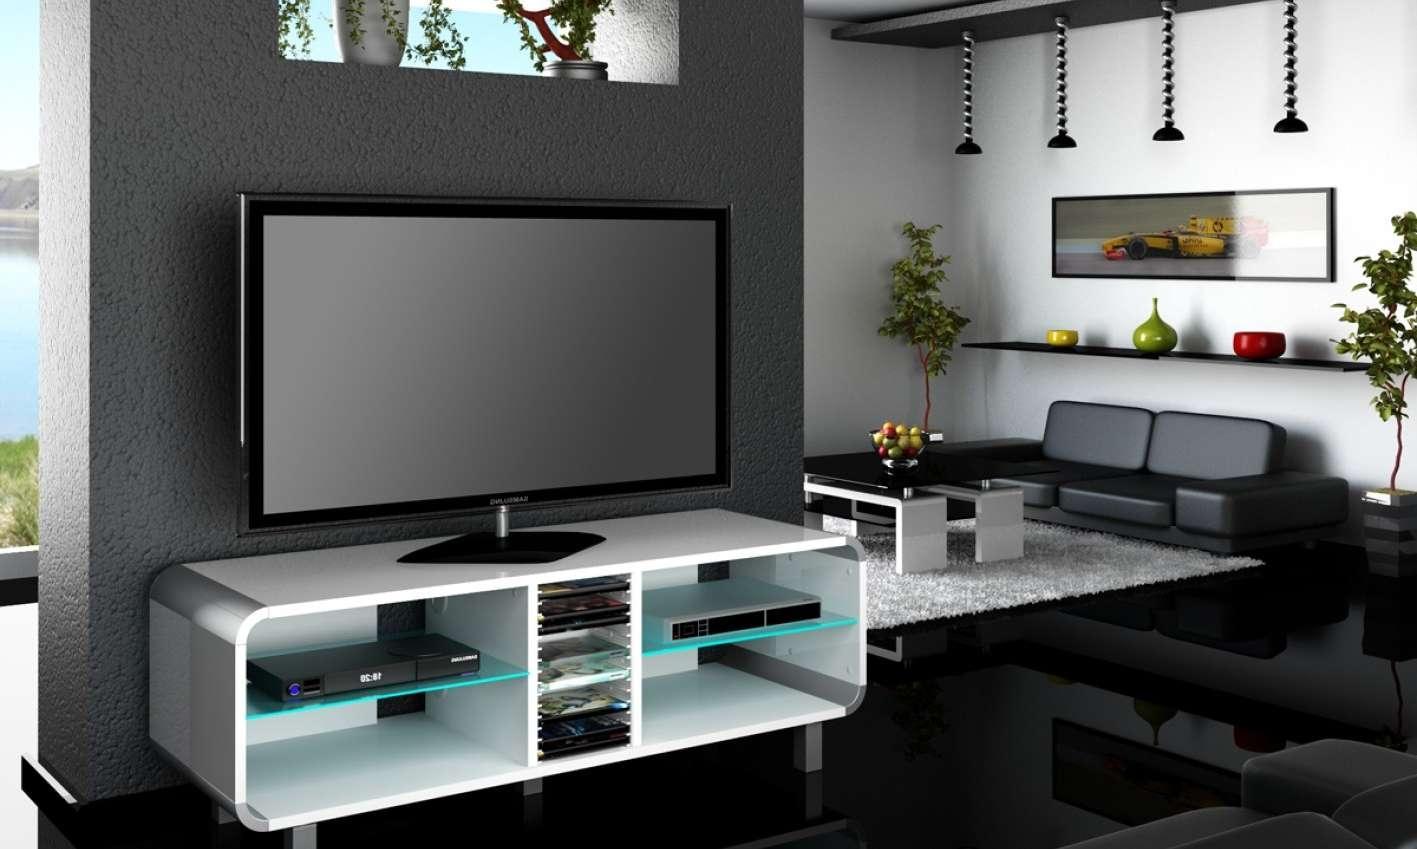 Tv : White High Gloss Corner Tv Stands Magnificent White High For White High Gloss Corner Tv Stands (View 14 of 20)